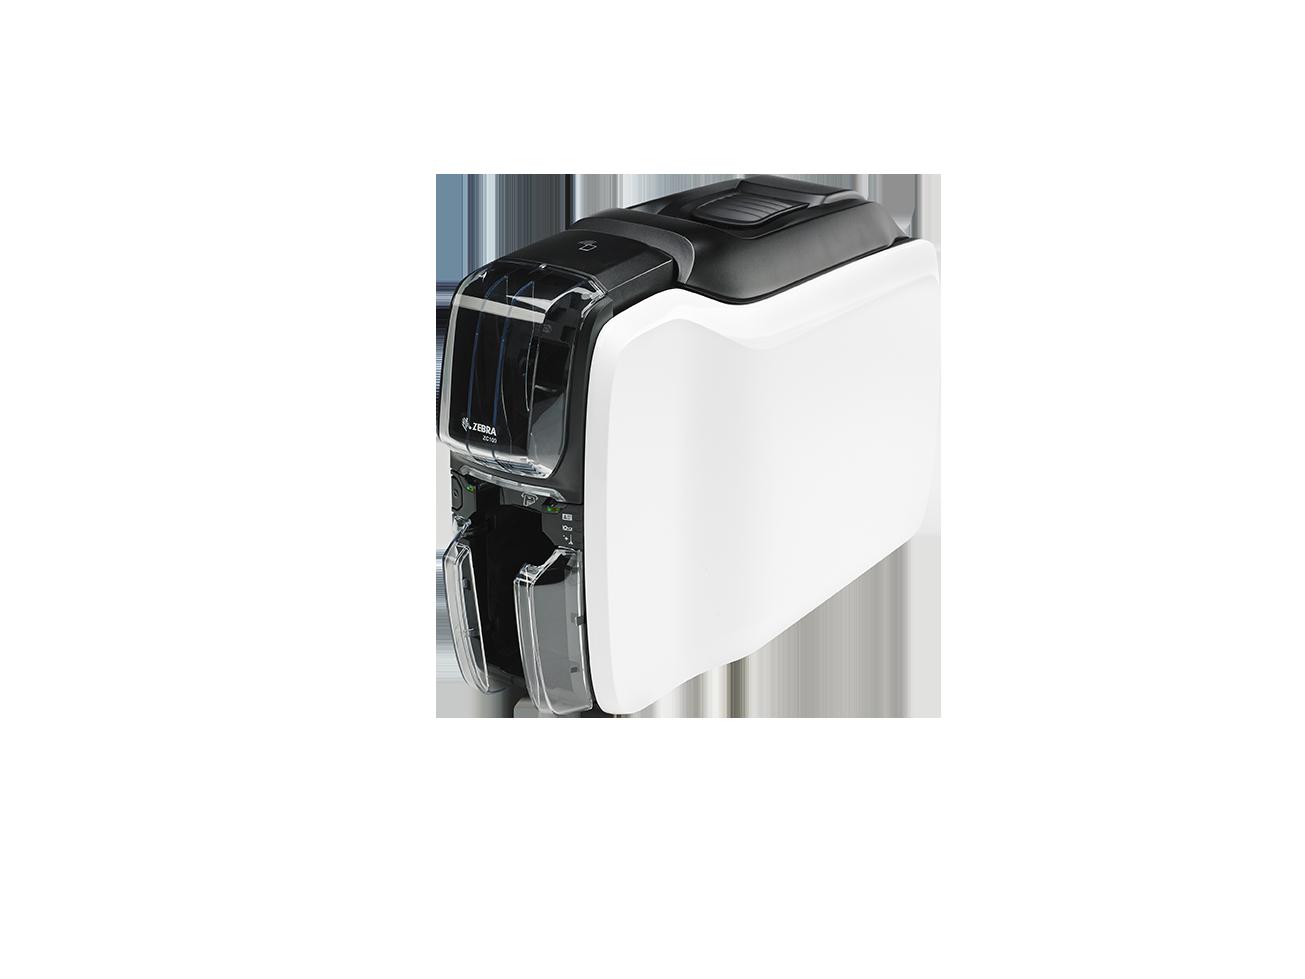 Obrázok produktu Zebra - tiskárna karet - Printer ZC100, Single Sided, USB & LAN